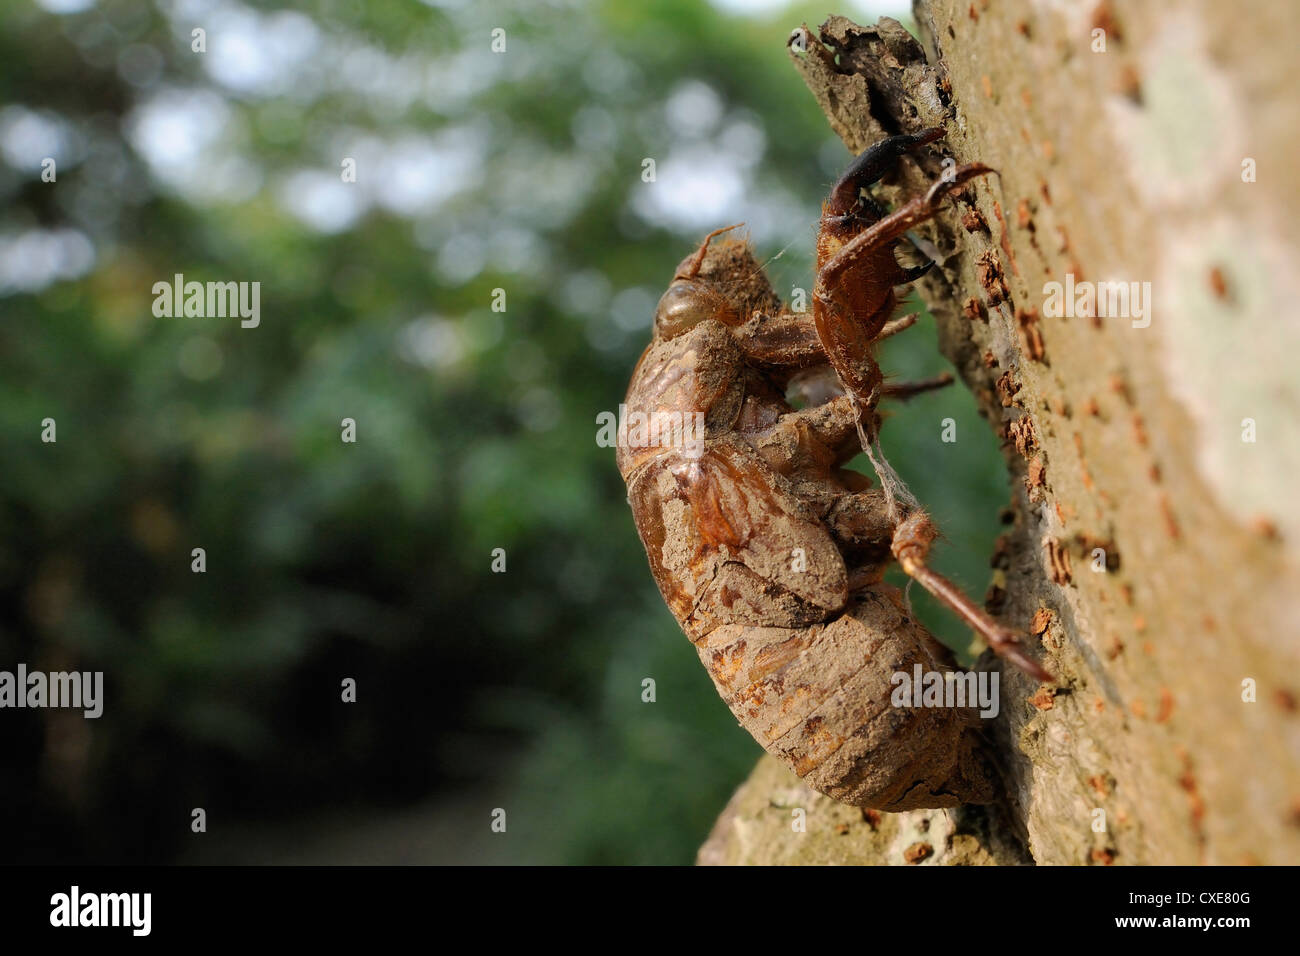 Taiwanese cicada (Cryptotympana takasagona) nymphal exuvium on tree trunk, Guandu, Taiwan - Stock Image